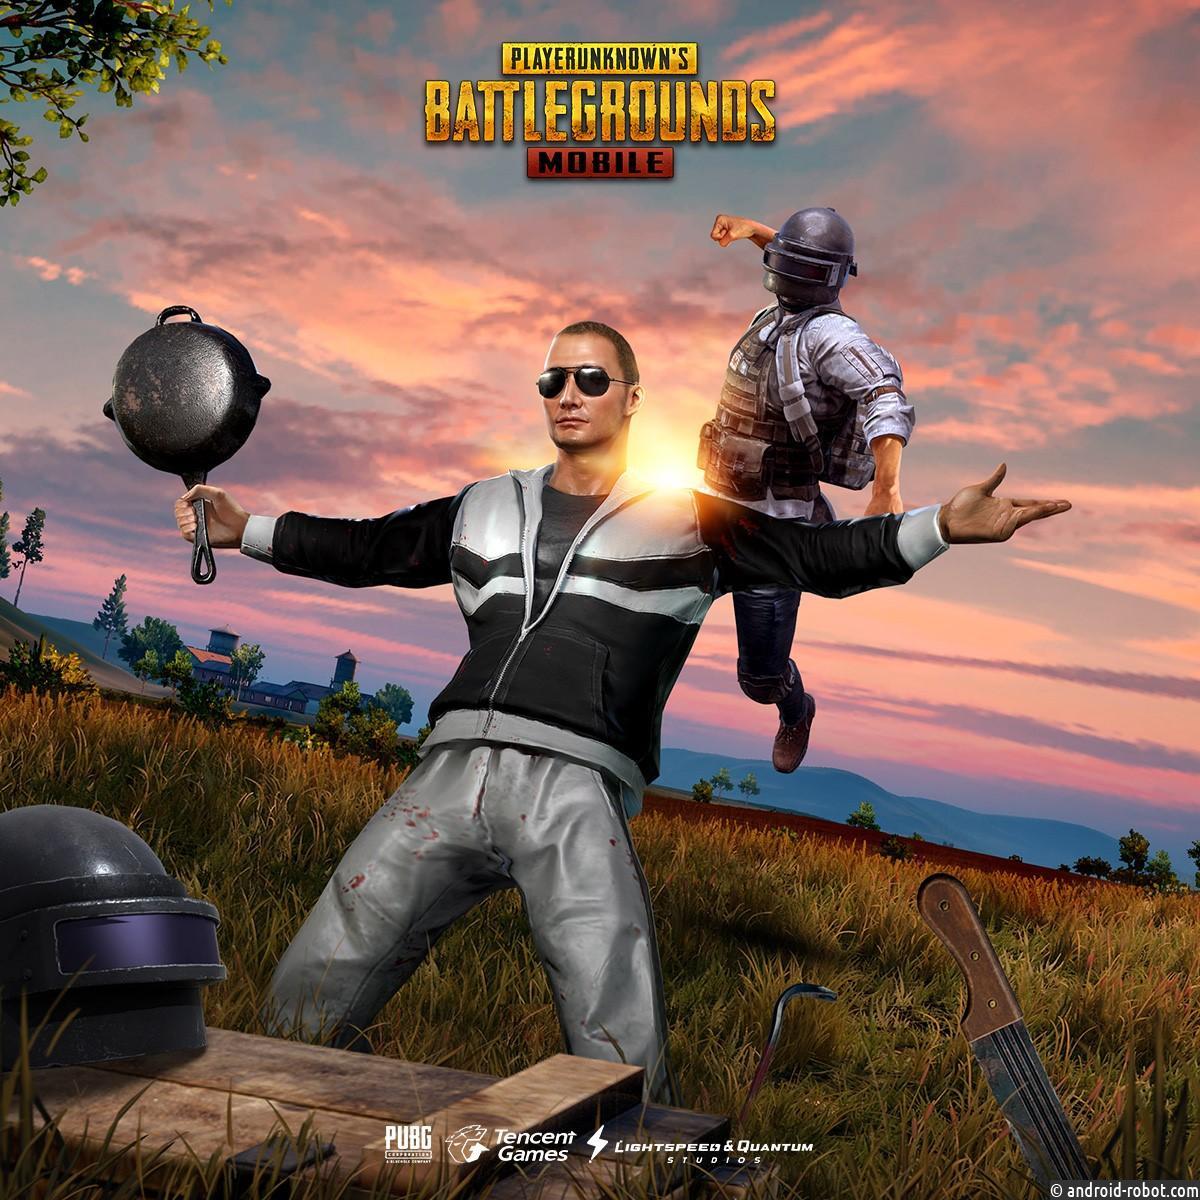 PUBG Corp. и Tencent выпустили второе обновление игры PlayerUnknown's Battlegrounds Mobile (PUBG MOBILE)